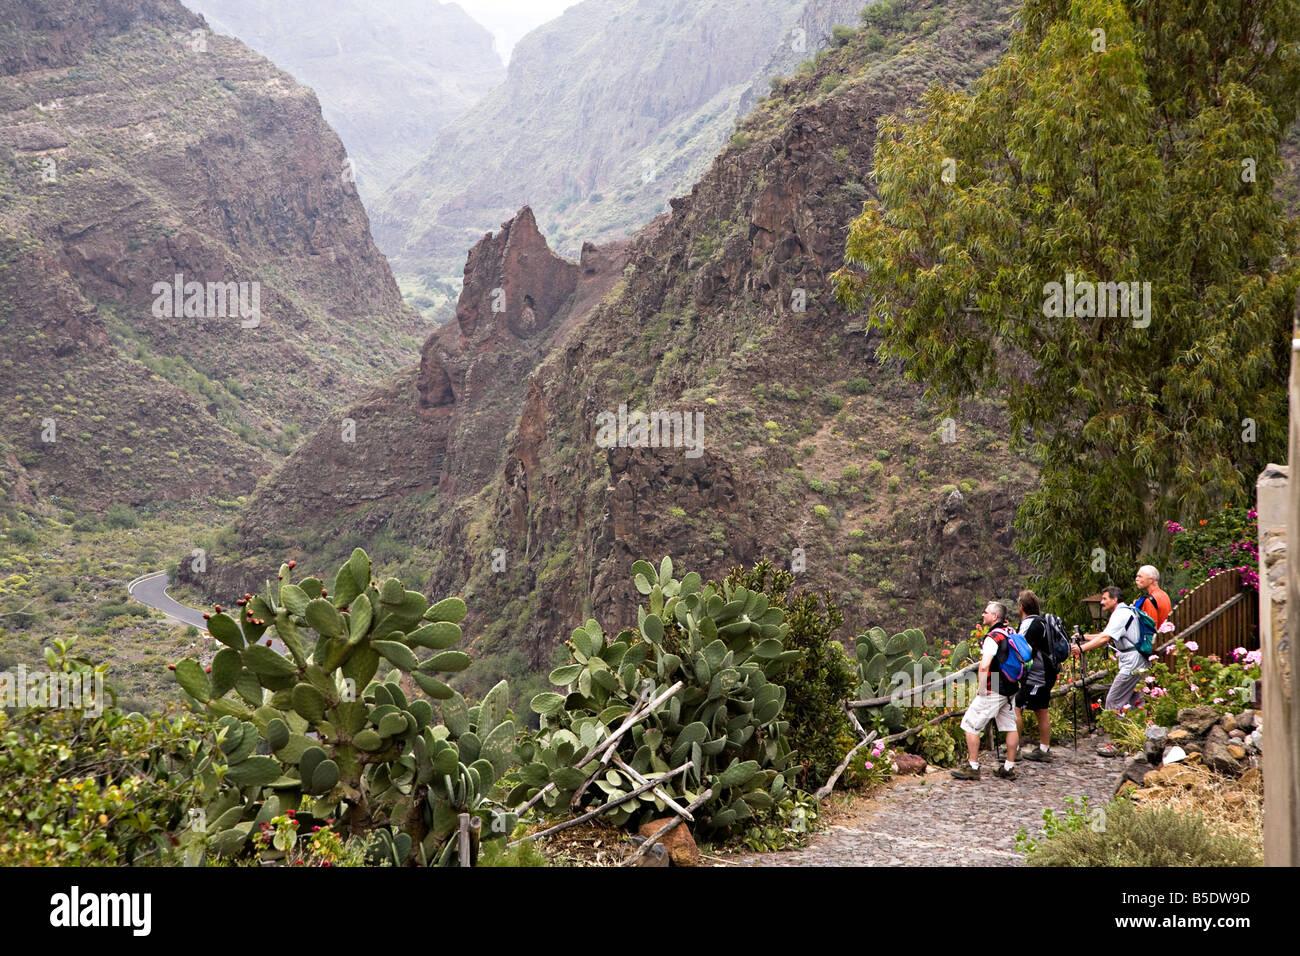 Hiking group in the Barranco de Guayadeque Gran Canaria Spain Stock Photo, Ro...